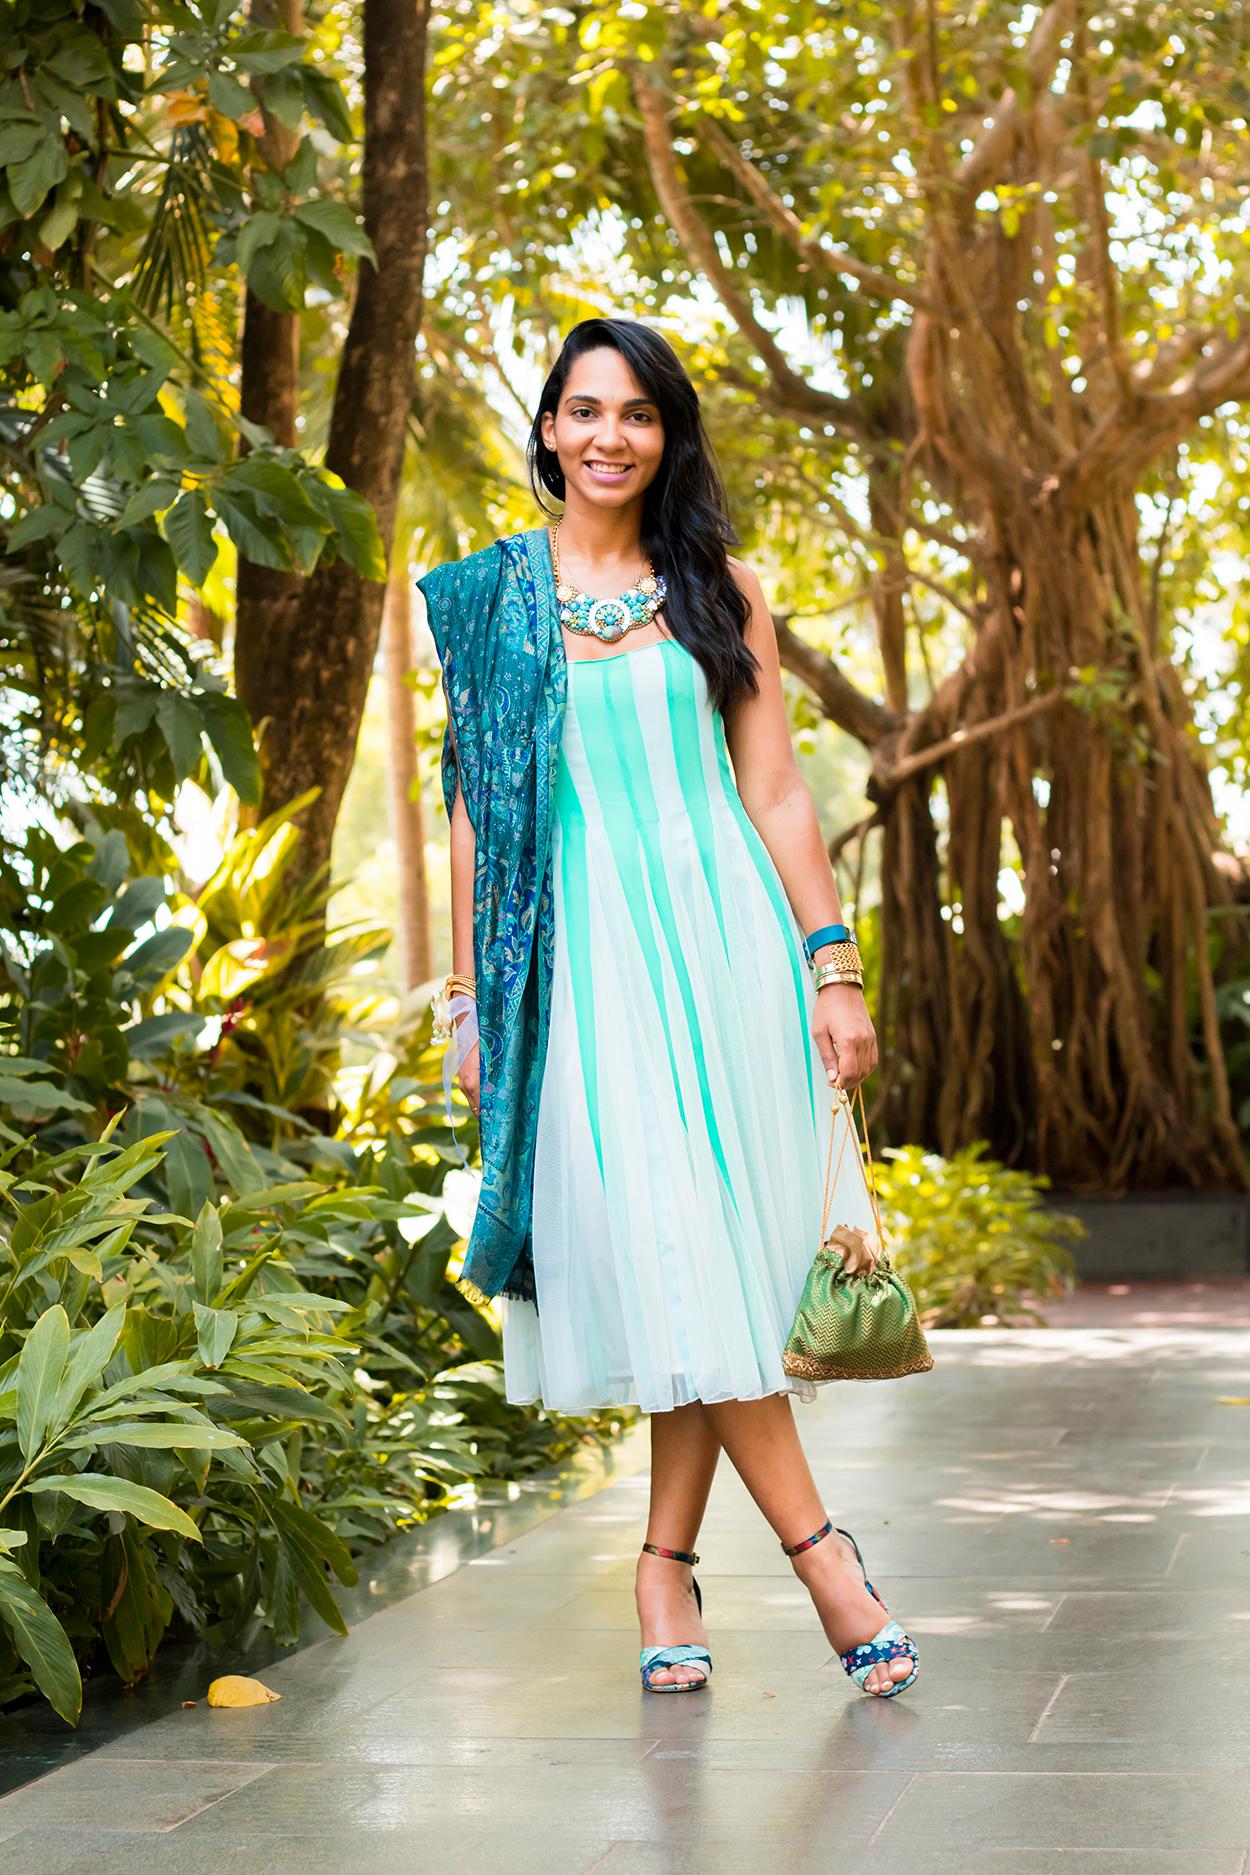 boda-hindu-indian-wedding-saree-goa-sageet-1